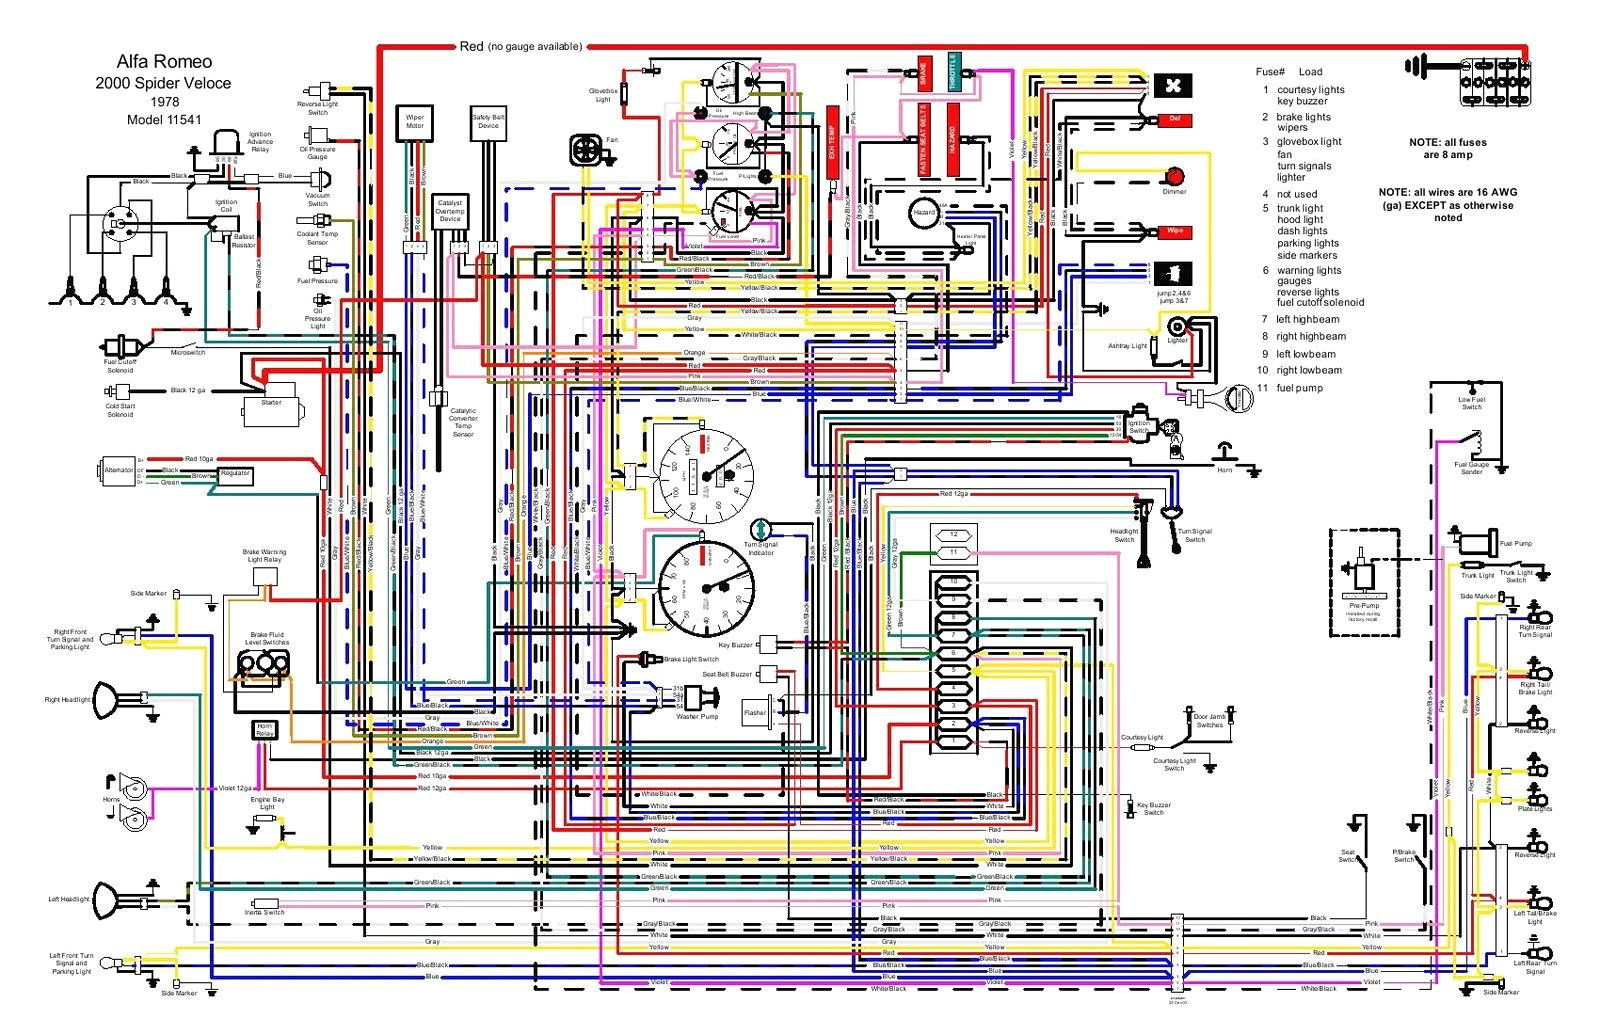 small resolution of alfa romeo accessories alfa circuit diagrams new wiring diagram alfa romeo 147 stereo wiring diagram